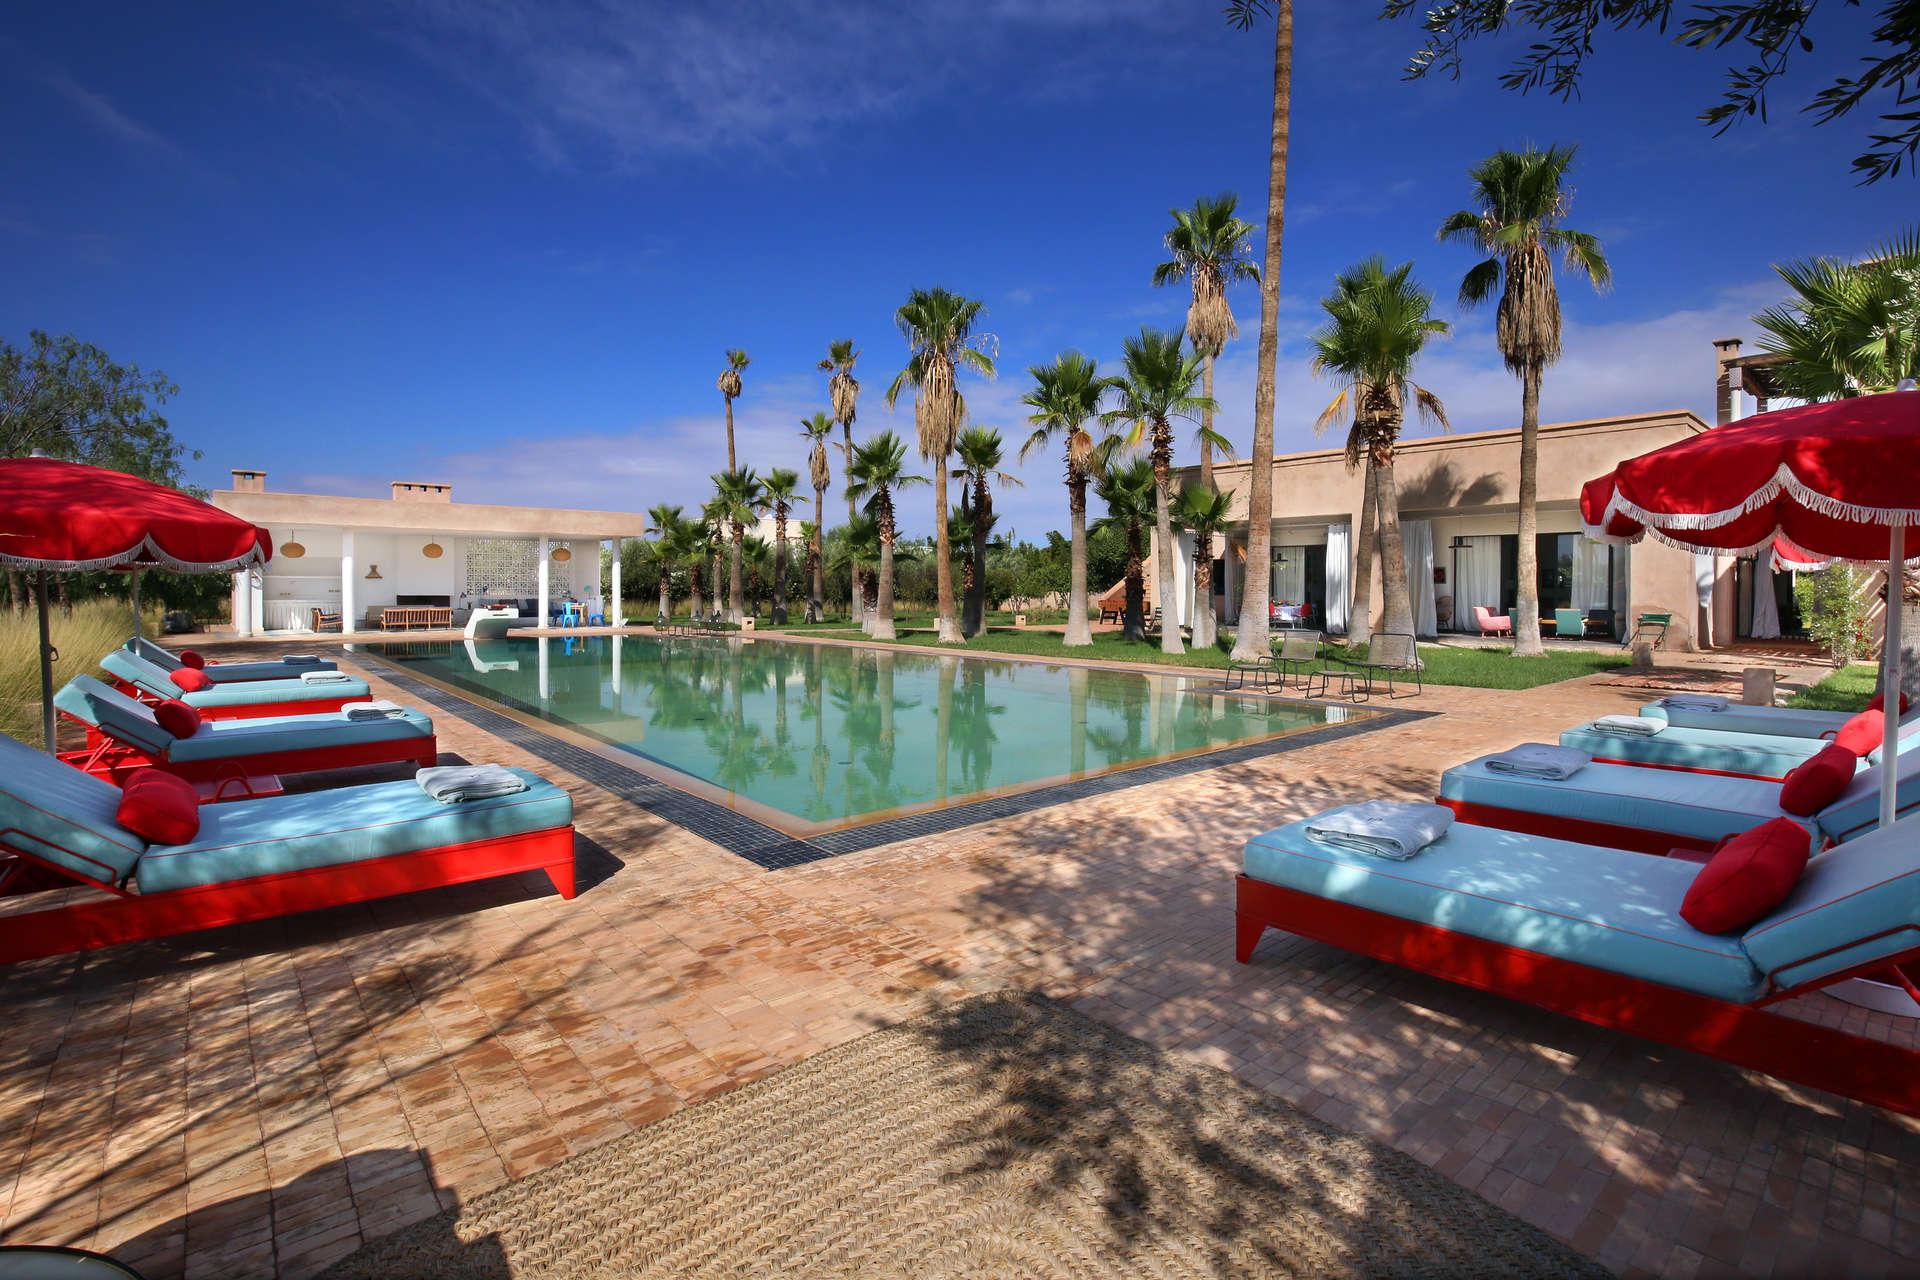 Luxury villa rentals africa - Morocco - Marrakesh - No location 4 - Valerie - Image 1/19